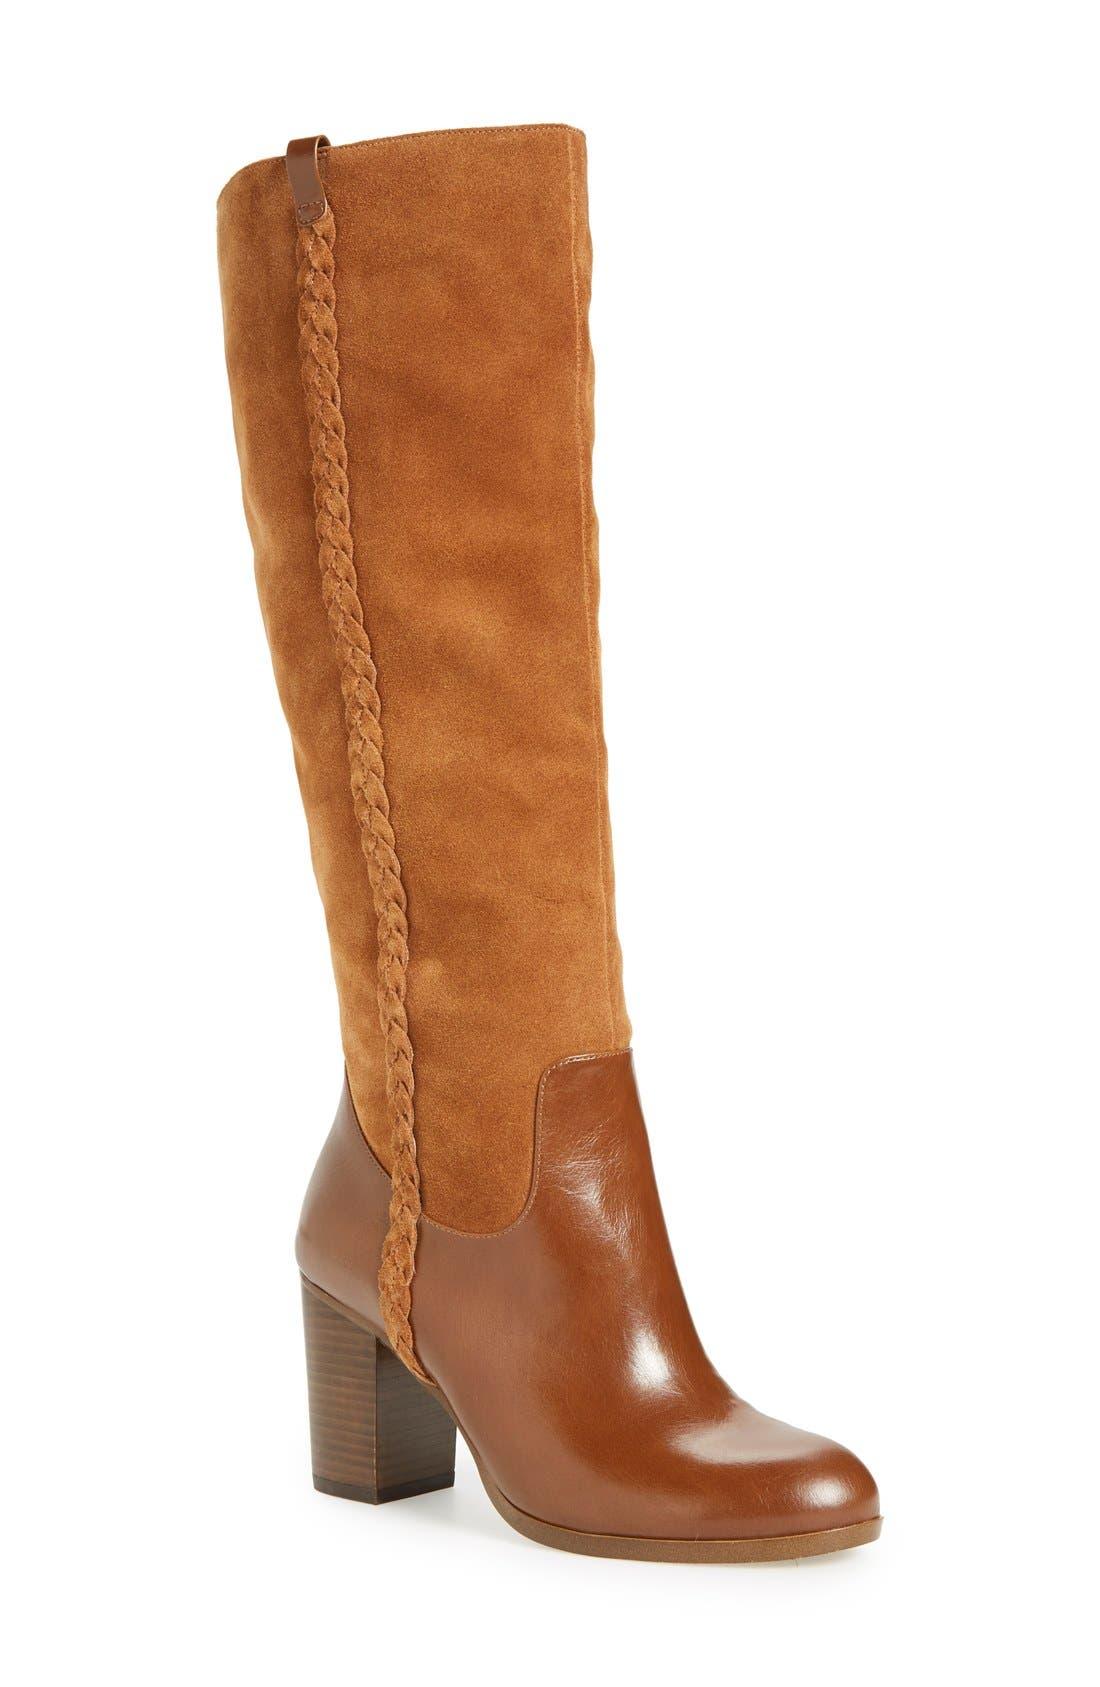 Alternate Image 1 Selected - BP. 'Trust' Tall Boot (Women)